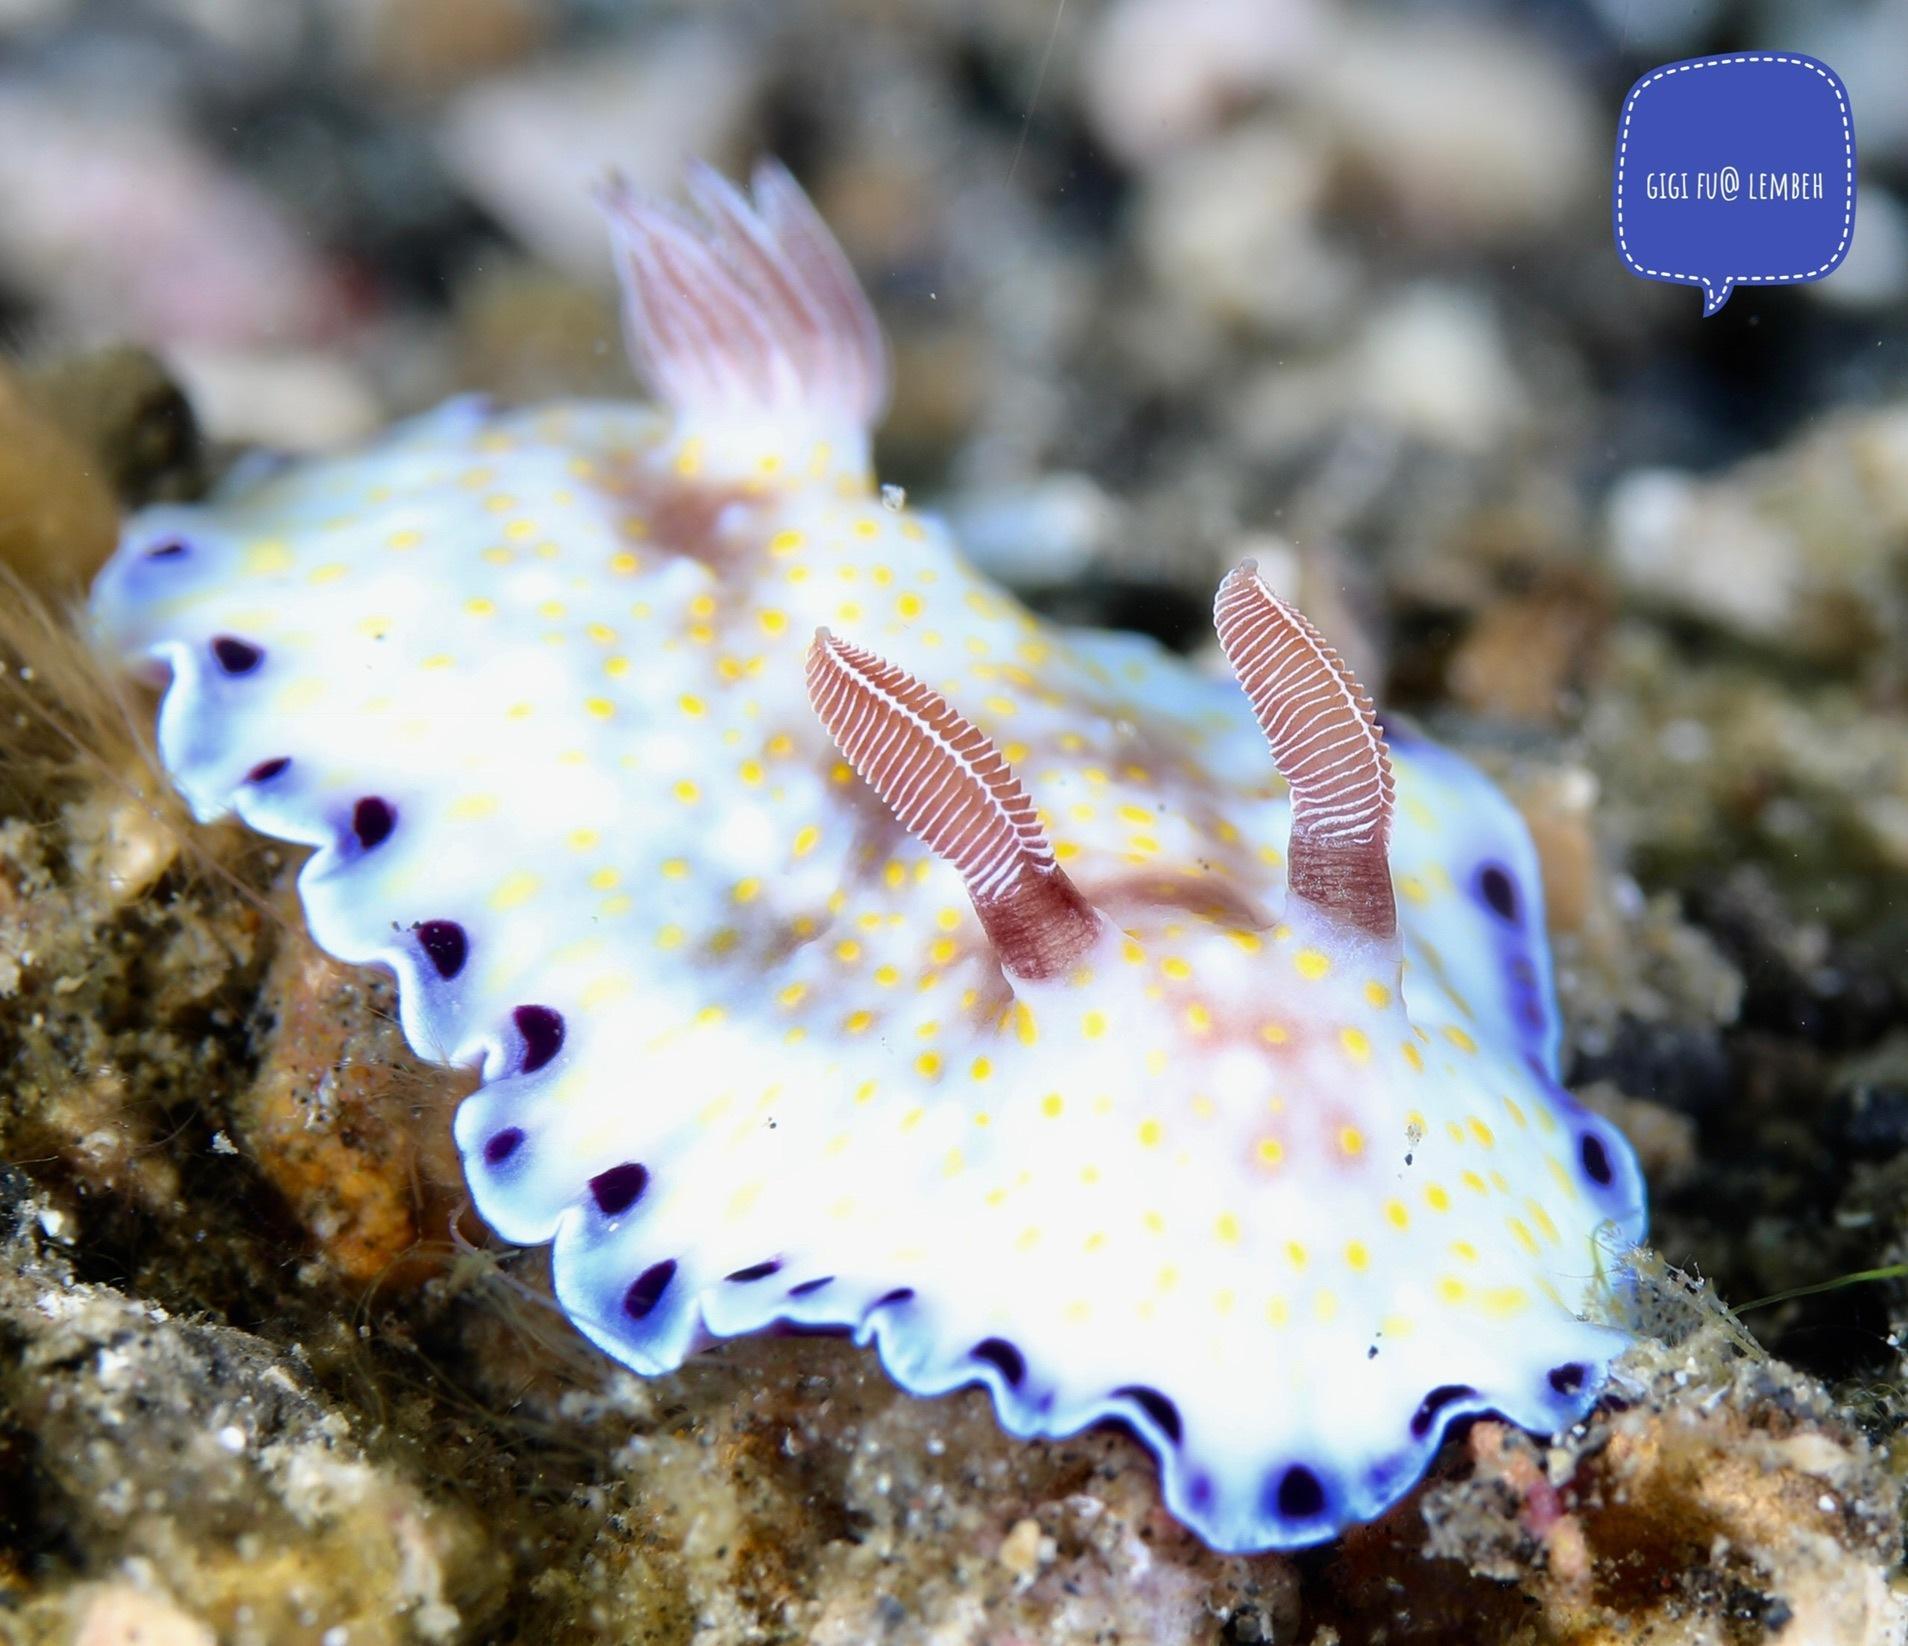 Nudibranch  by Gigi Fu